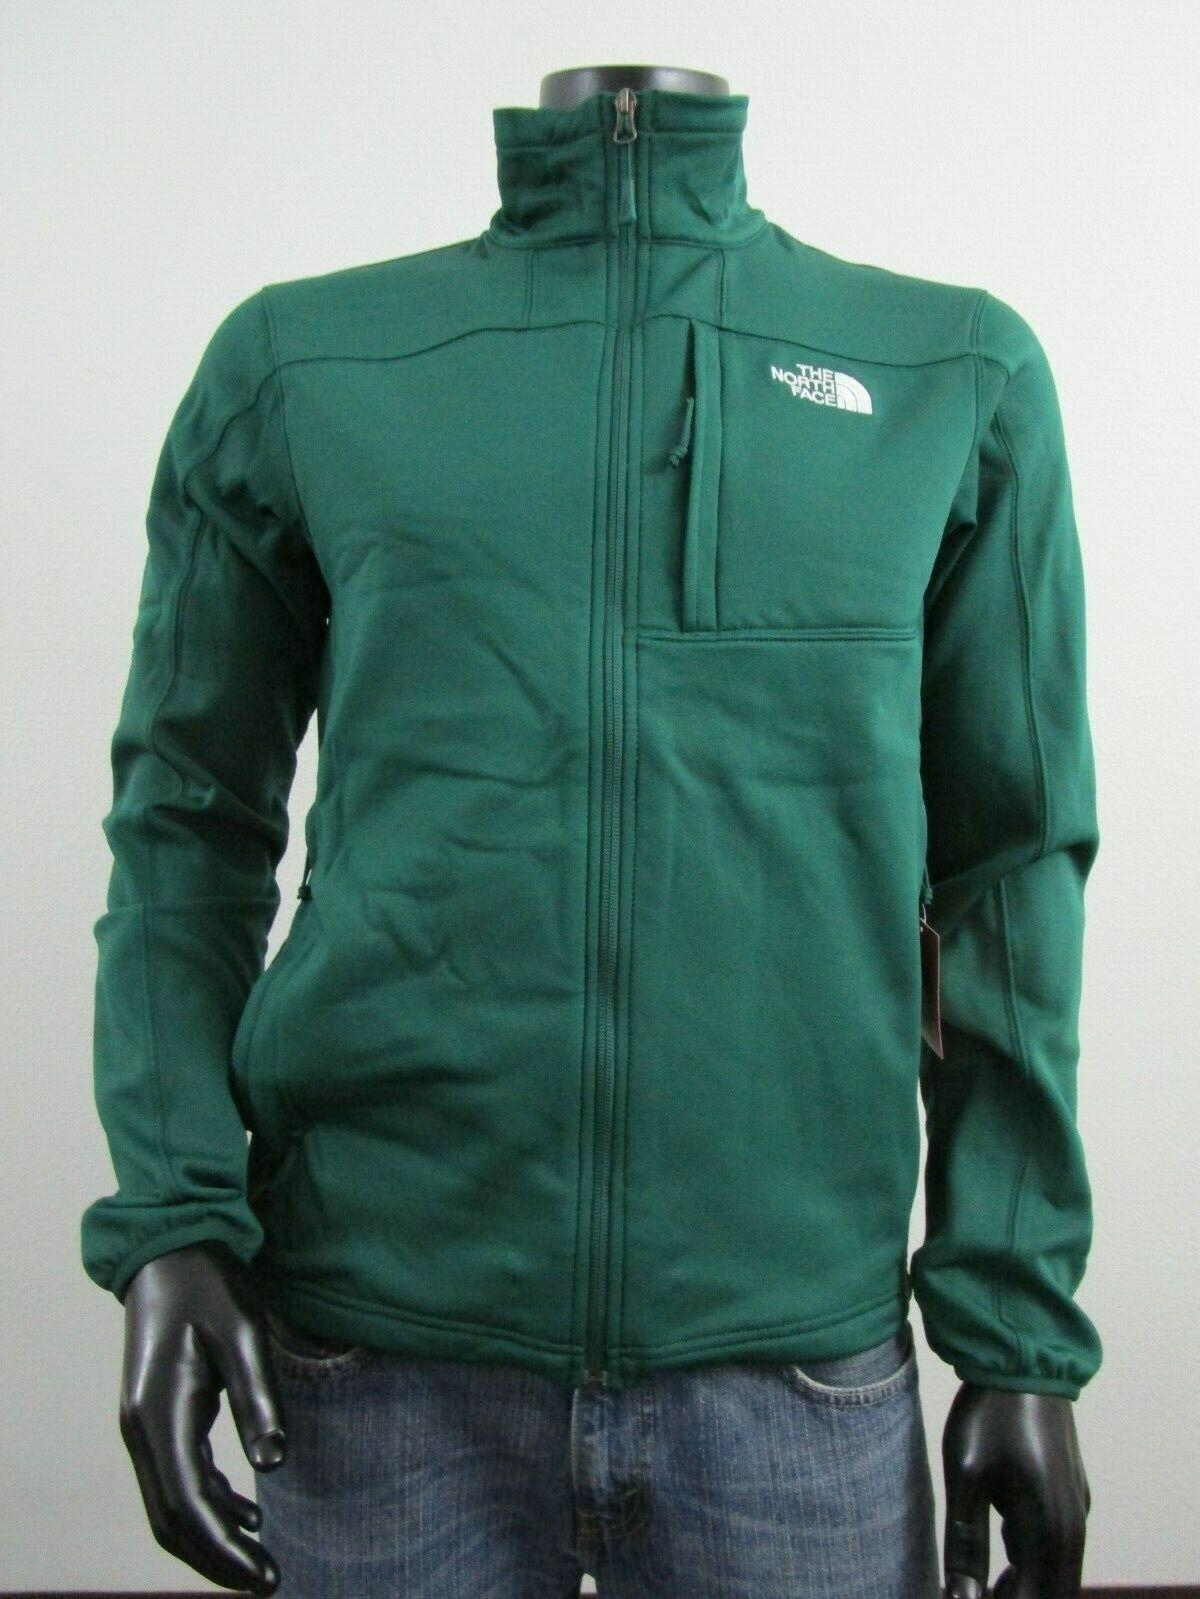 Nwt Mens Tnf The North Face Cinder 200 Fz Tenacious Fleece Jacket Green North Face Fleece Jacket Fleece Jacket North Face Fleece [ 1599 x 1200 Pixel ]